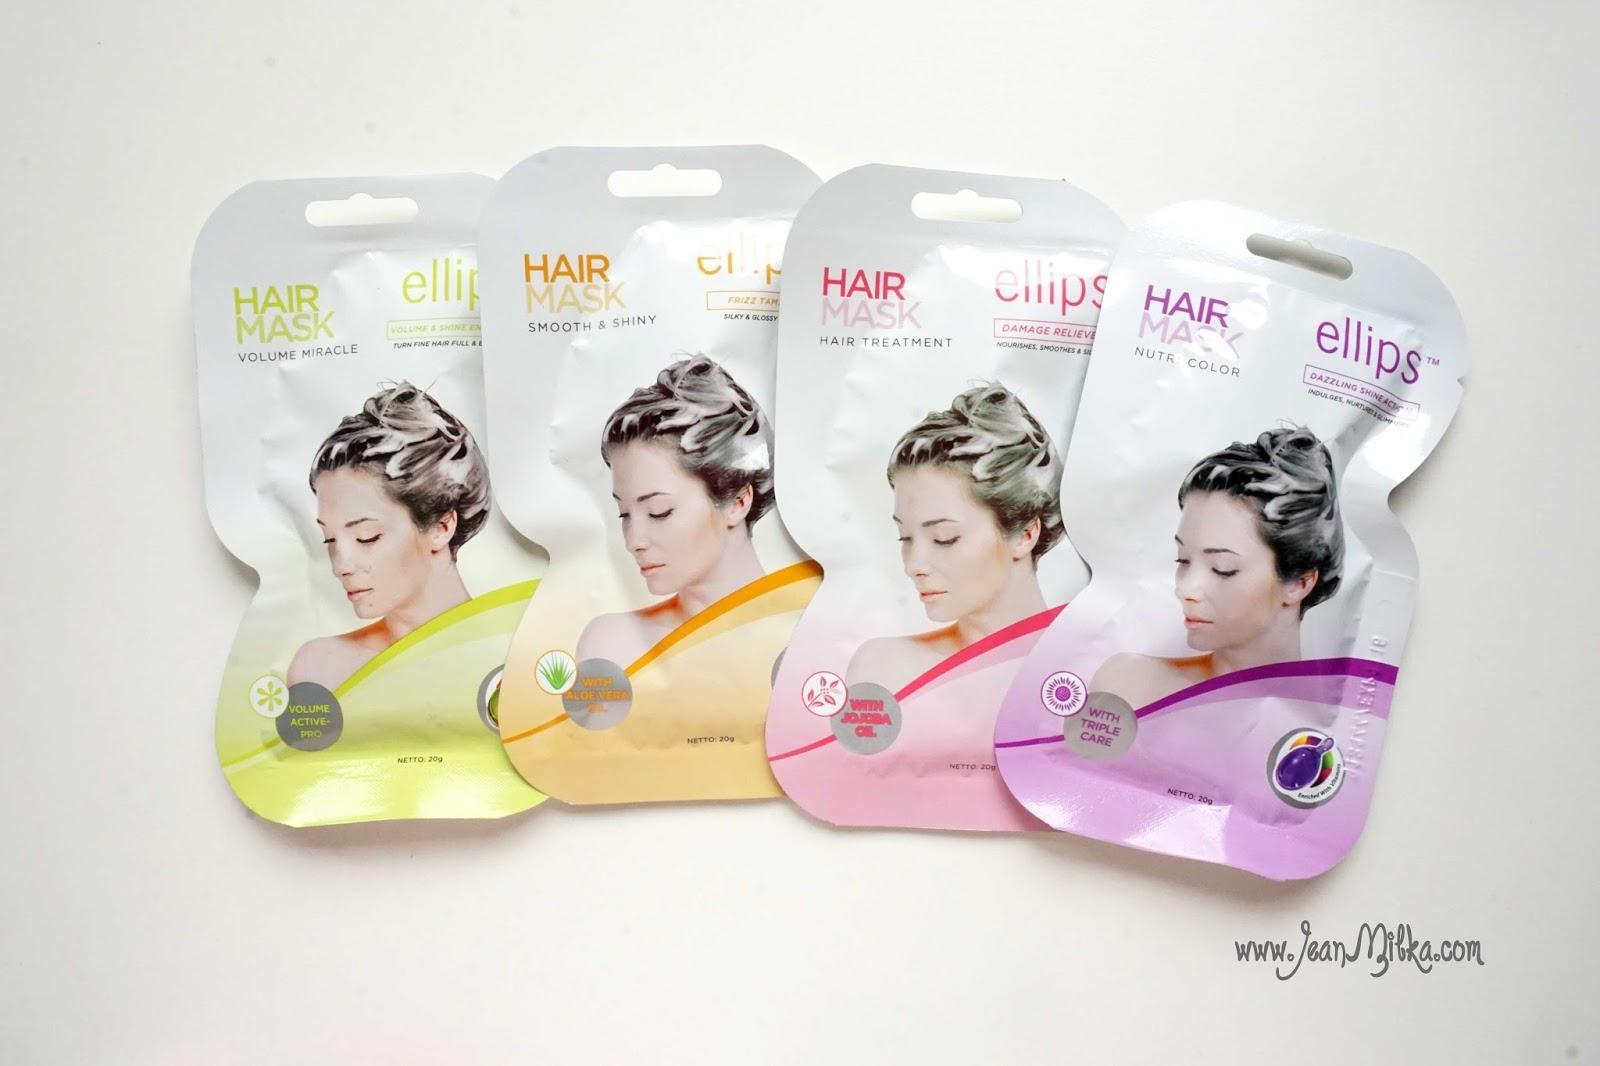 [Sachet] ELLIPS VITAMIN HAIR MASK 20g / Masker Vitamin Rambut - Vitamin Rambut Terlaris - Kesehatan Rambut -  Perawatan Rambut - HAIR MASK Origial - Best Seller